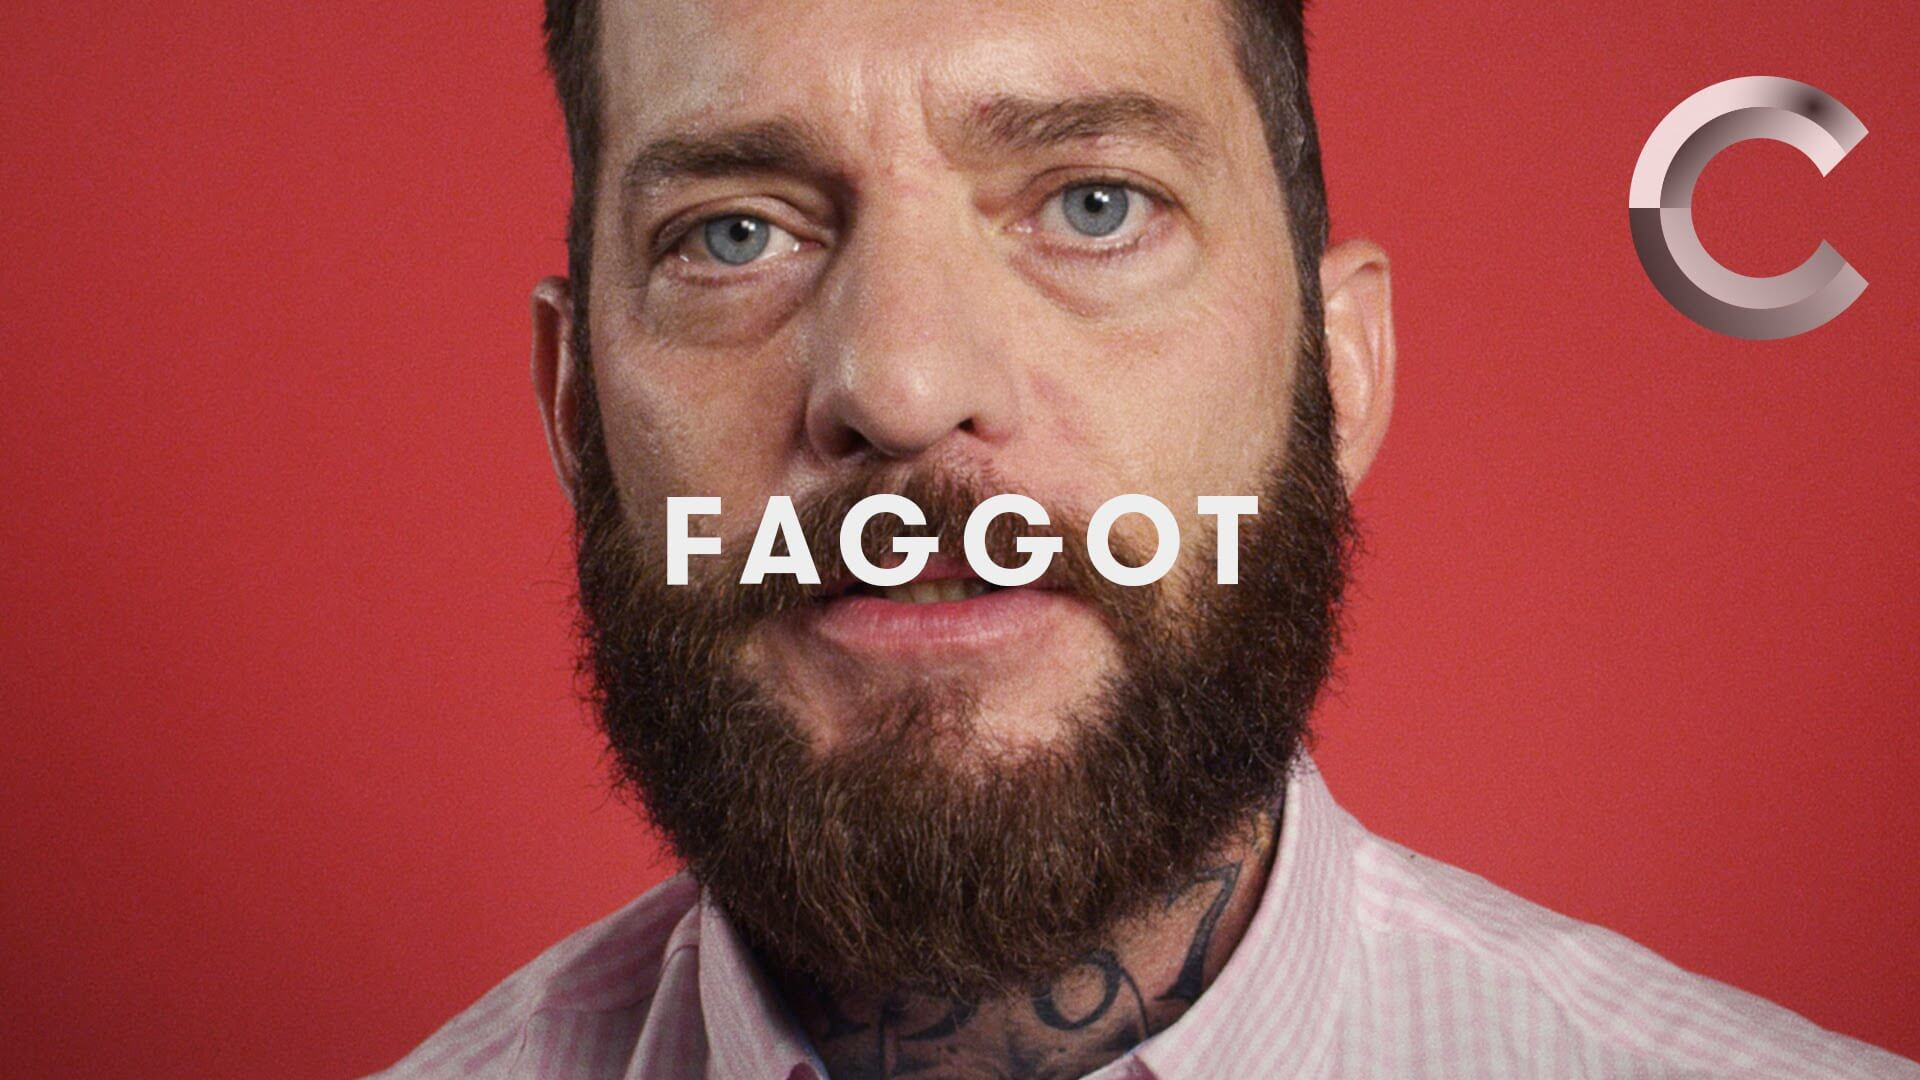 esperimenti_sociali_gay_parola_frocio